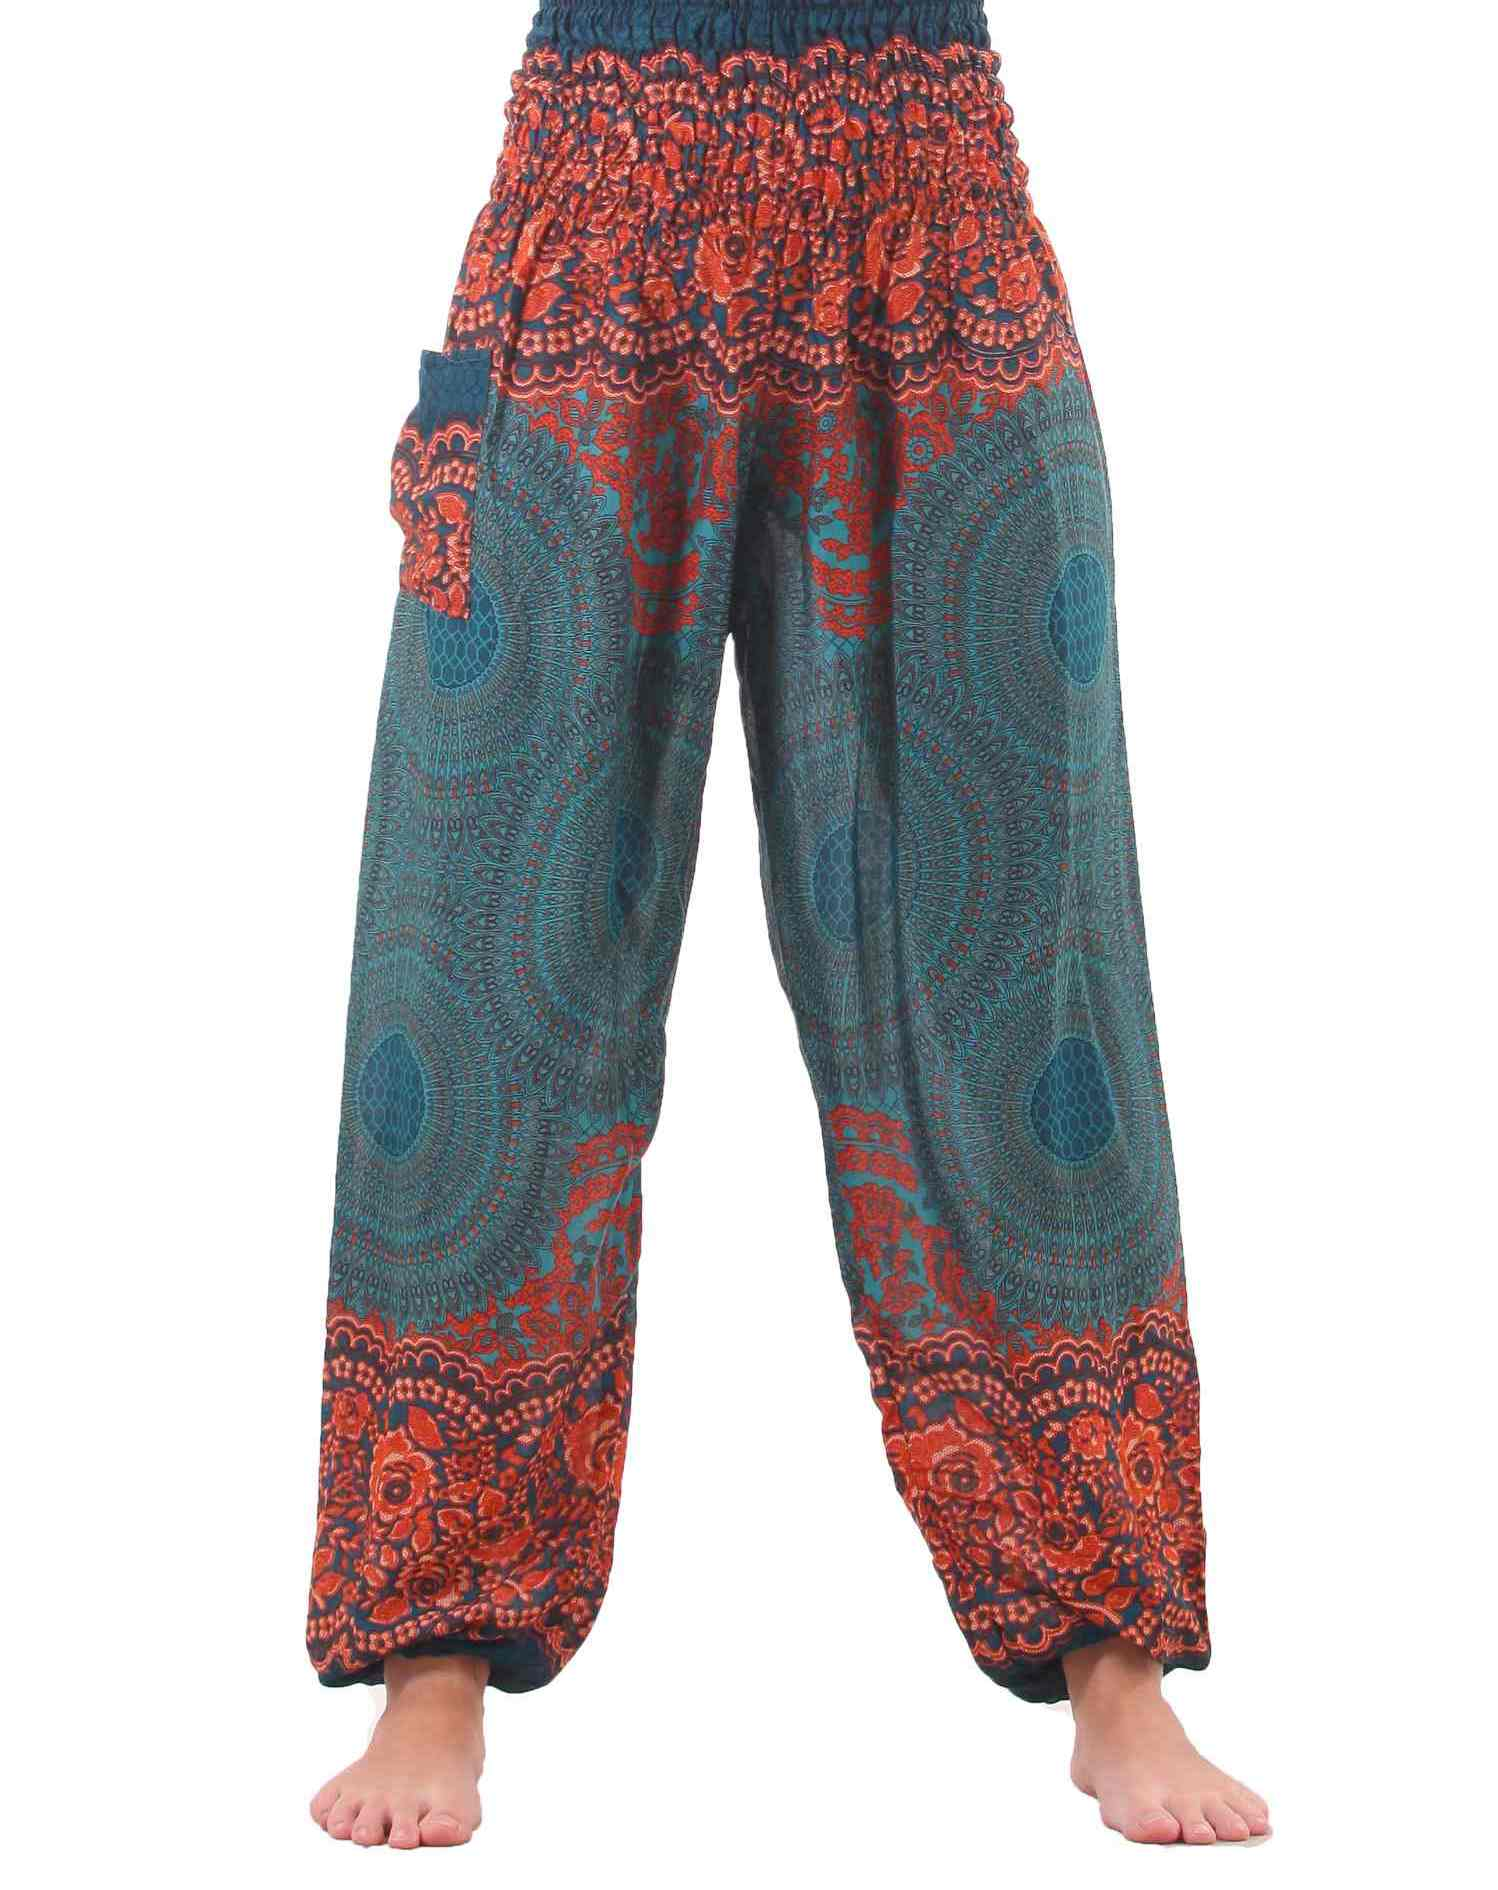 plus size mandala harem hippie pants in turquoise UEZBPKK